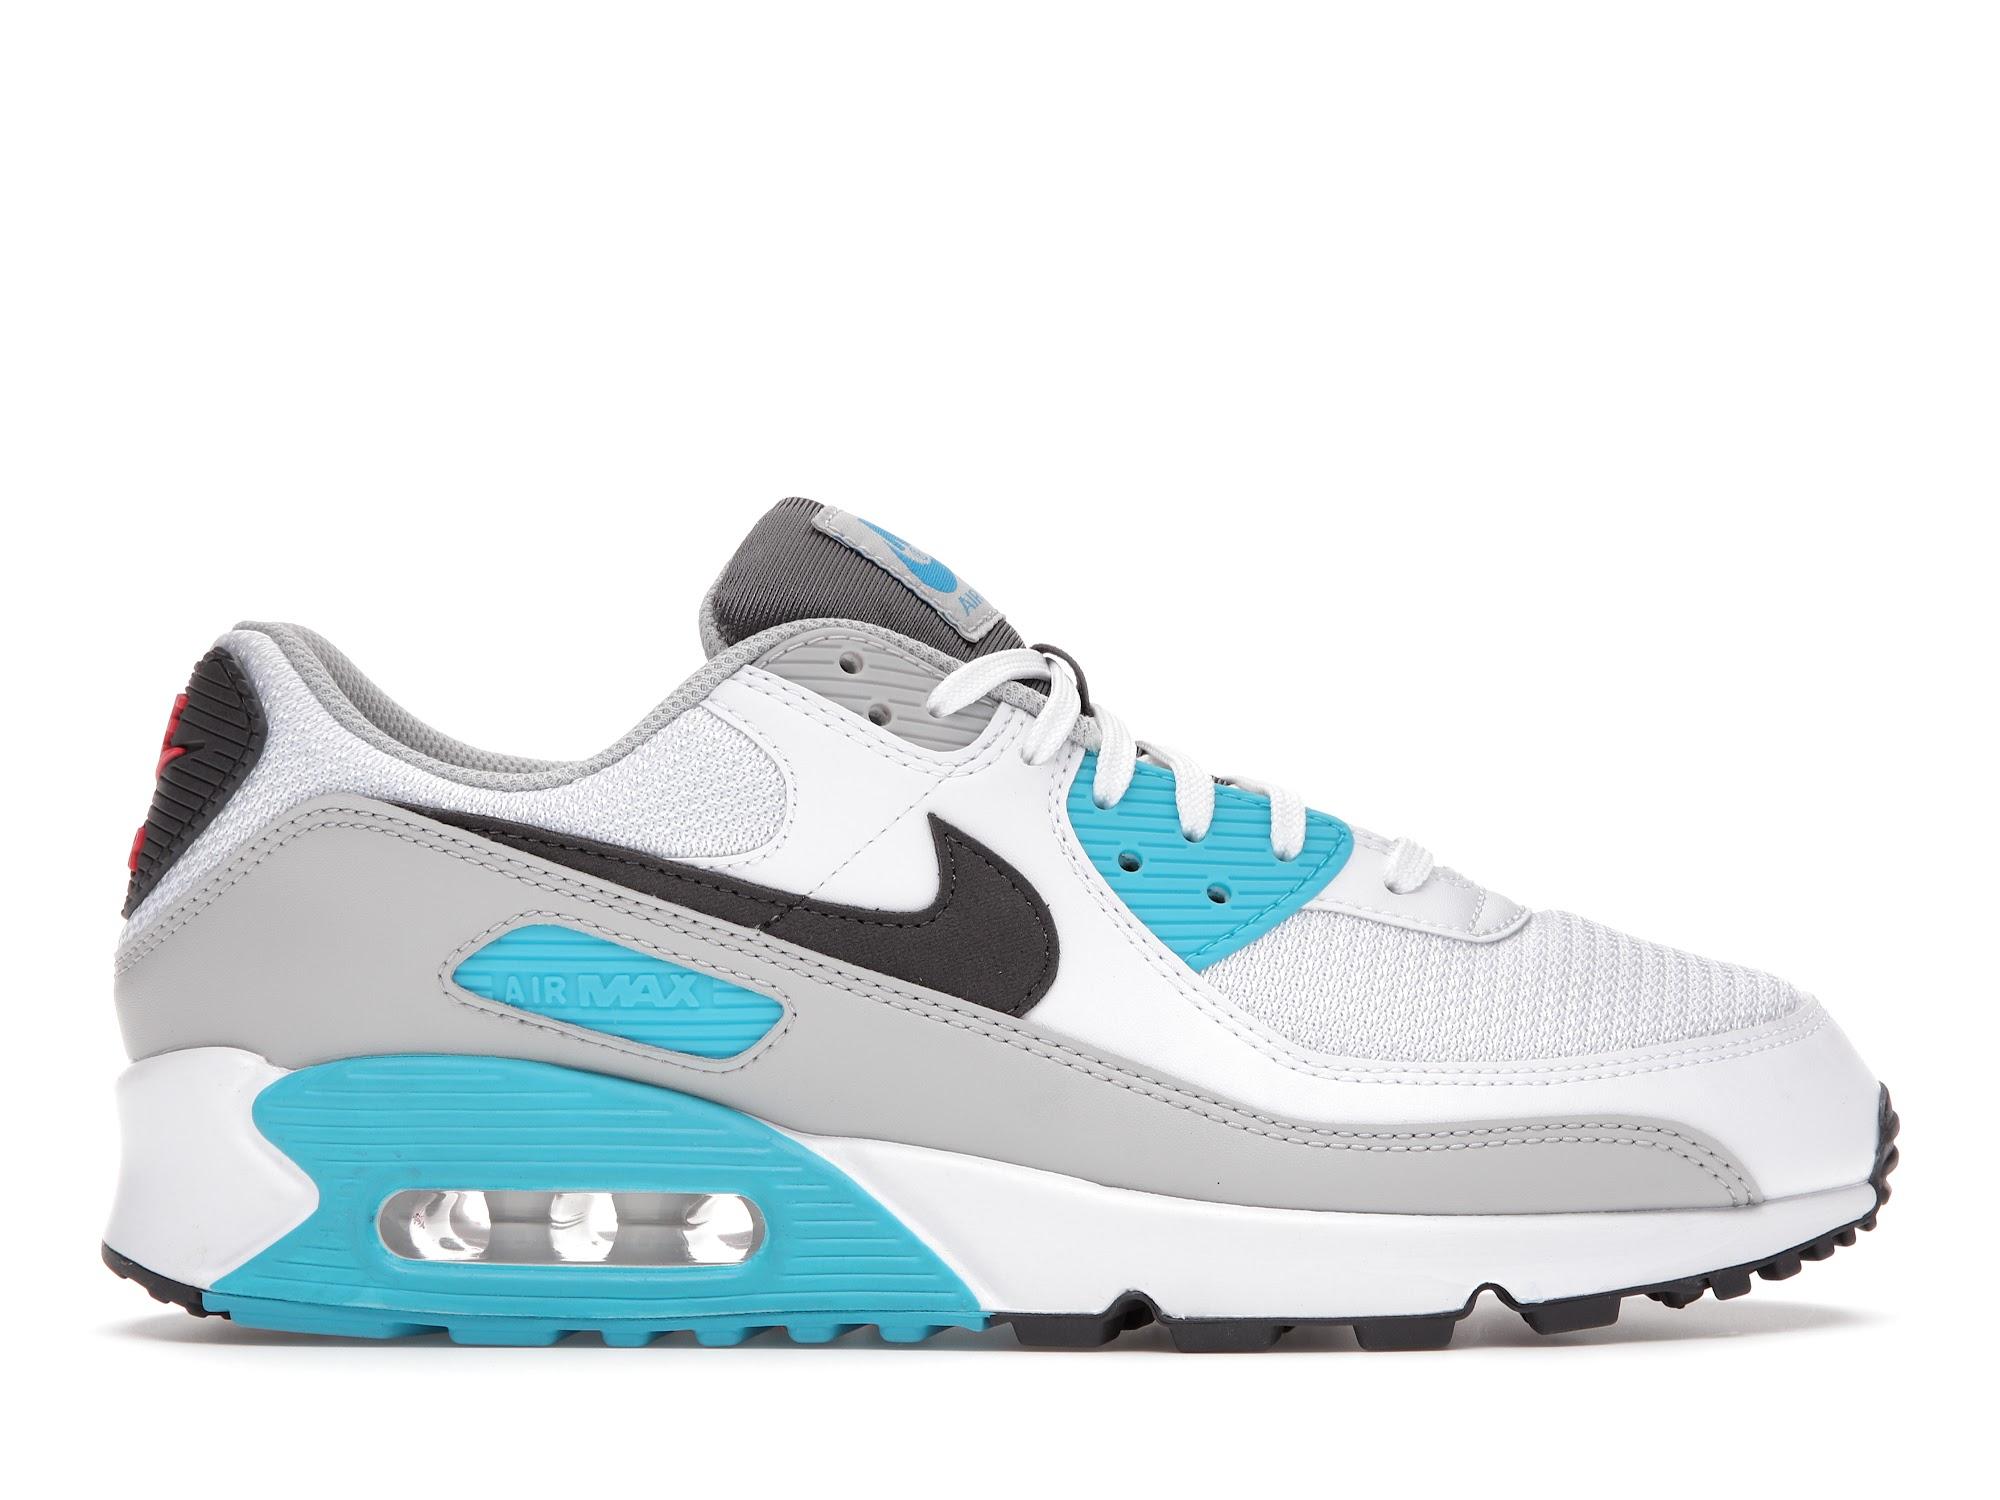 Nike Air Max 90 Chlorine Blue